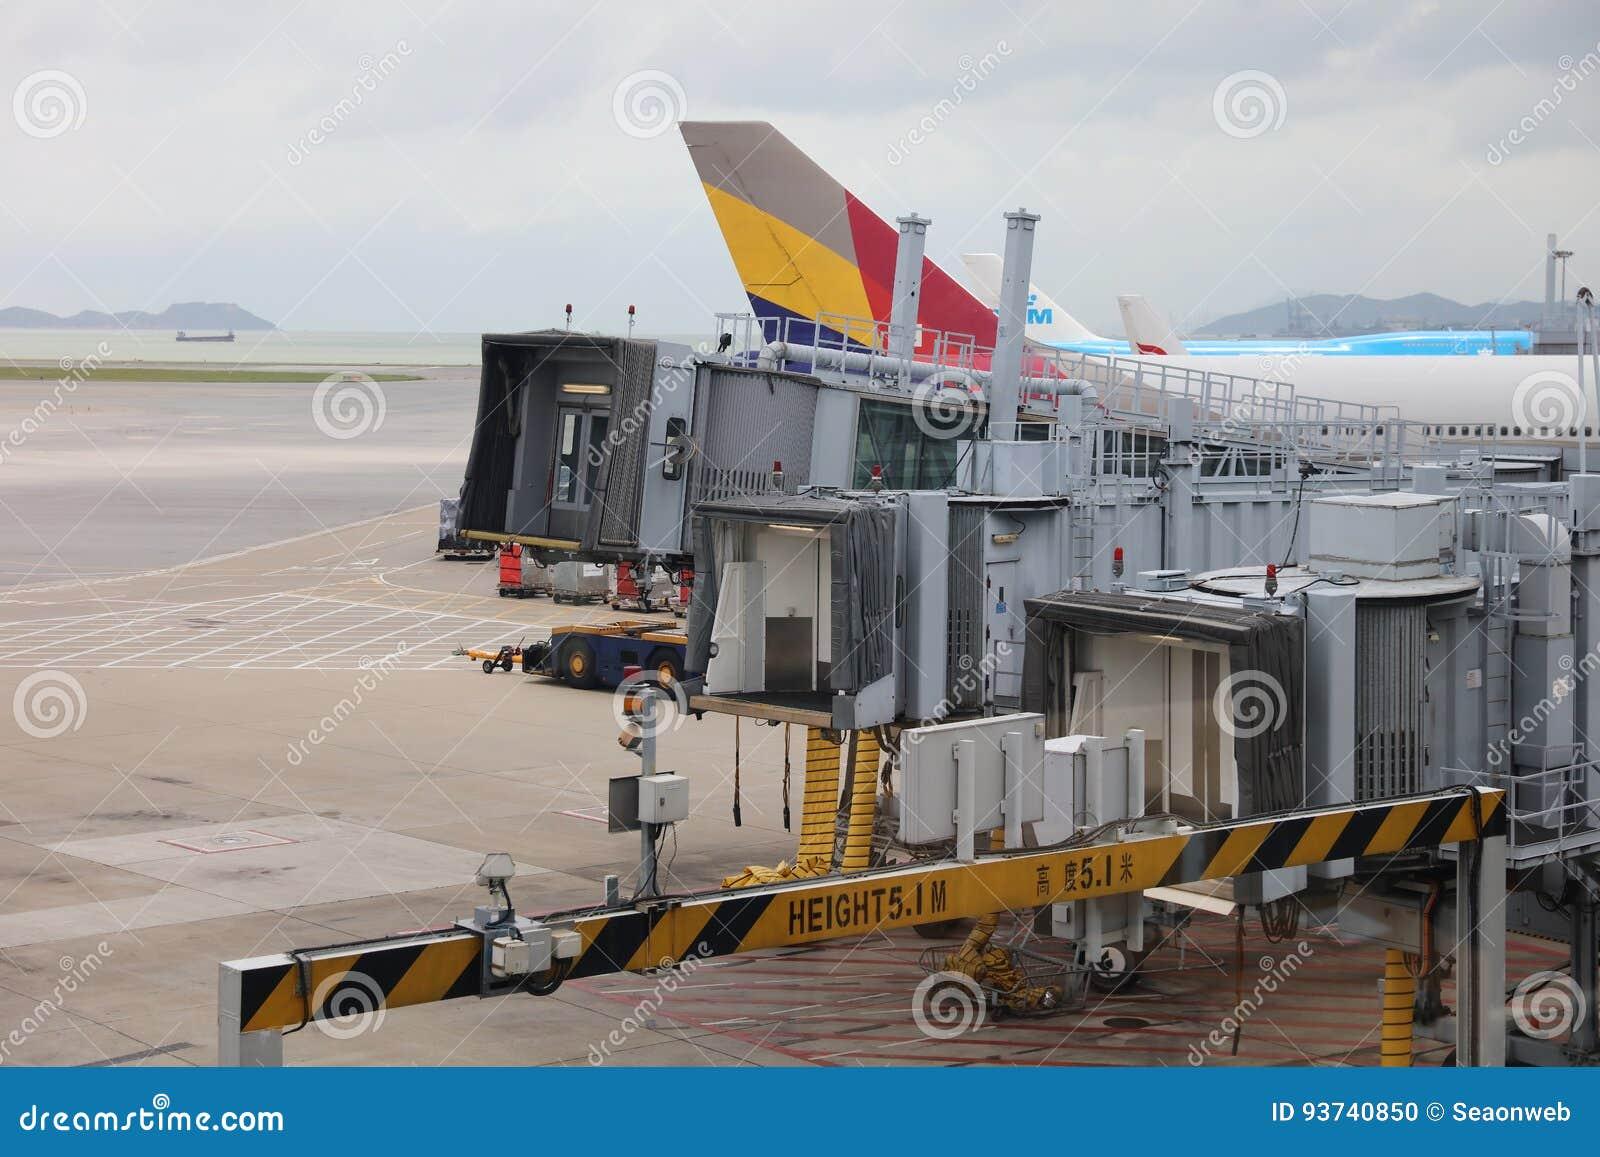 runway of Hong Kong International Airport site.